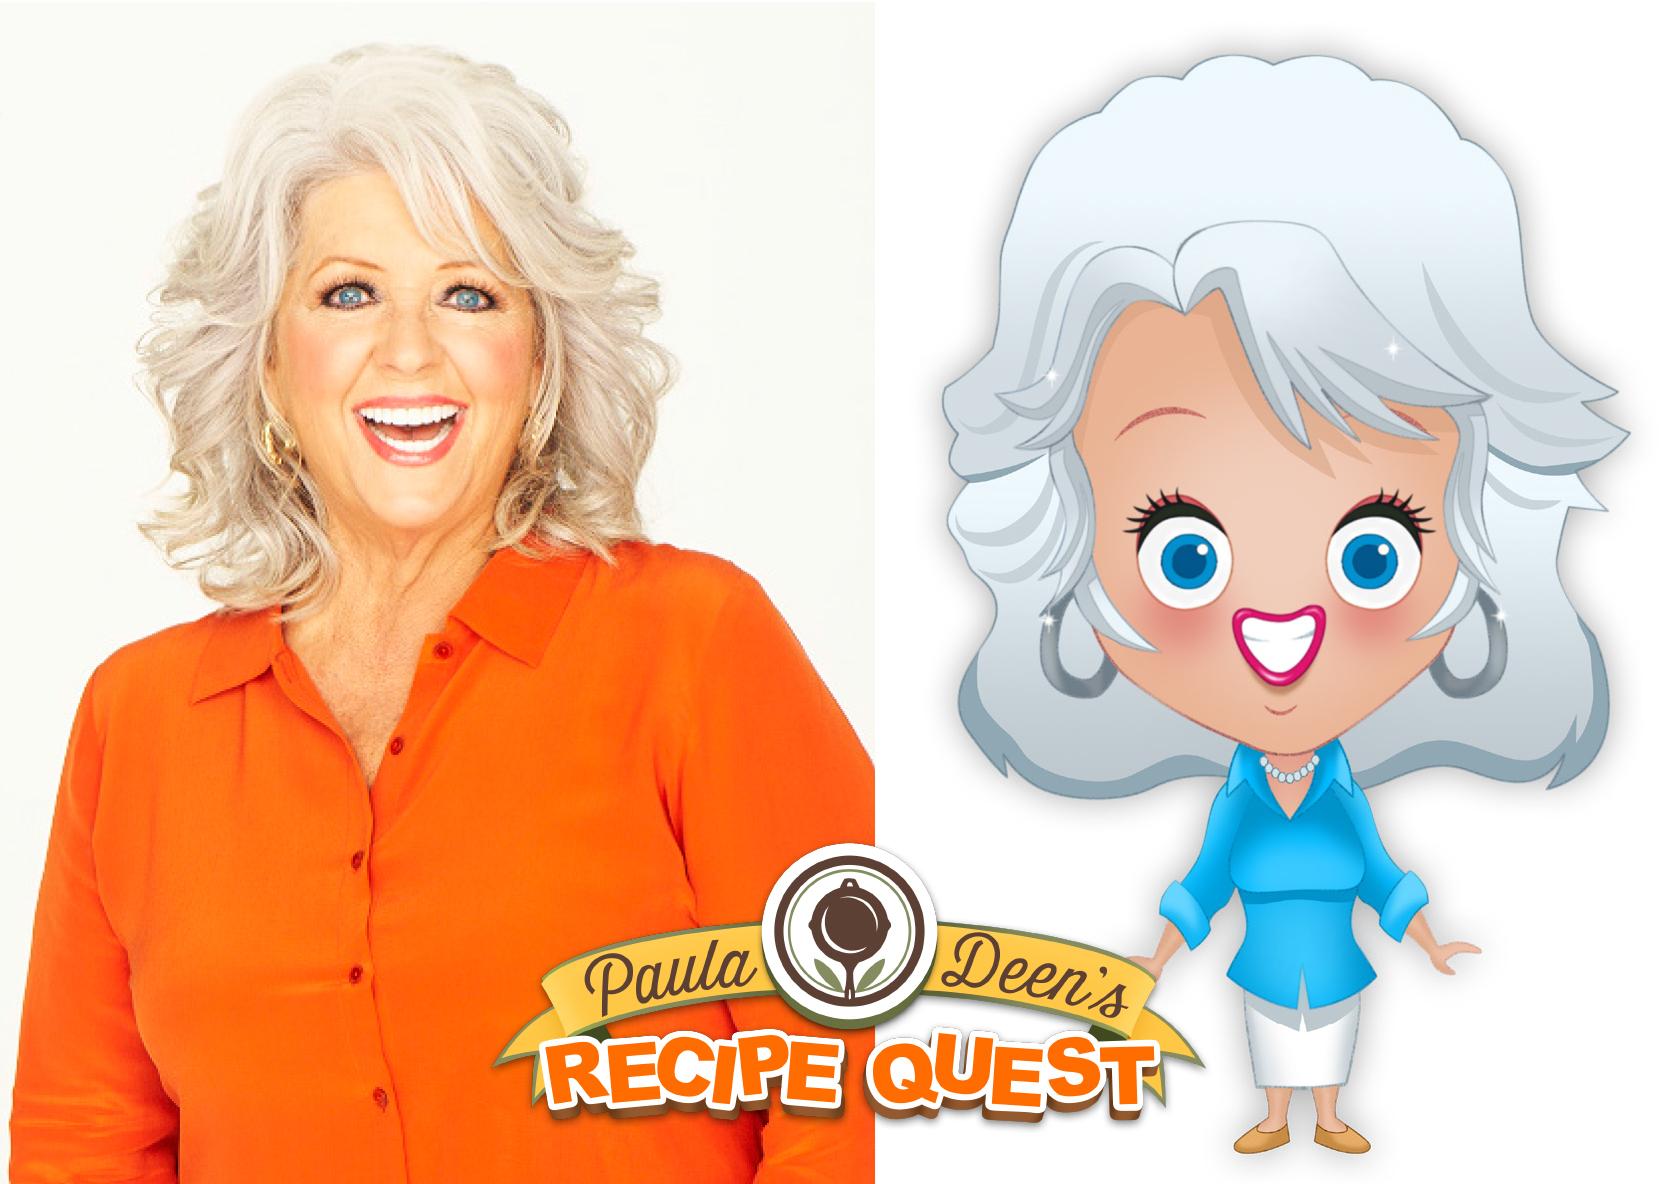 Paula Deen's Recipe Quest (Photo: Business Wire)